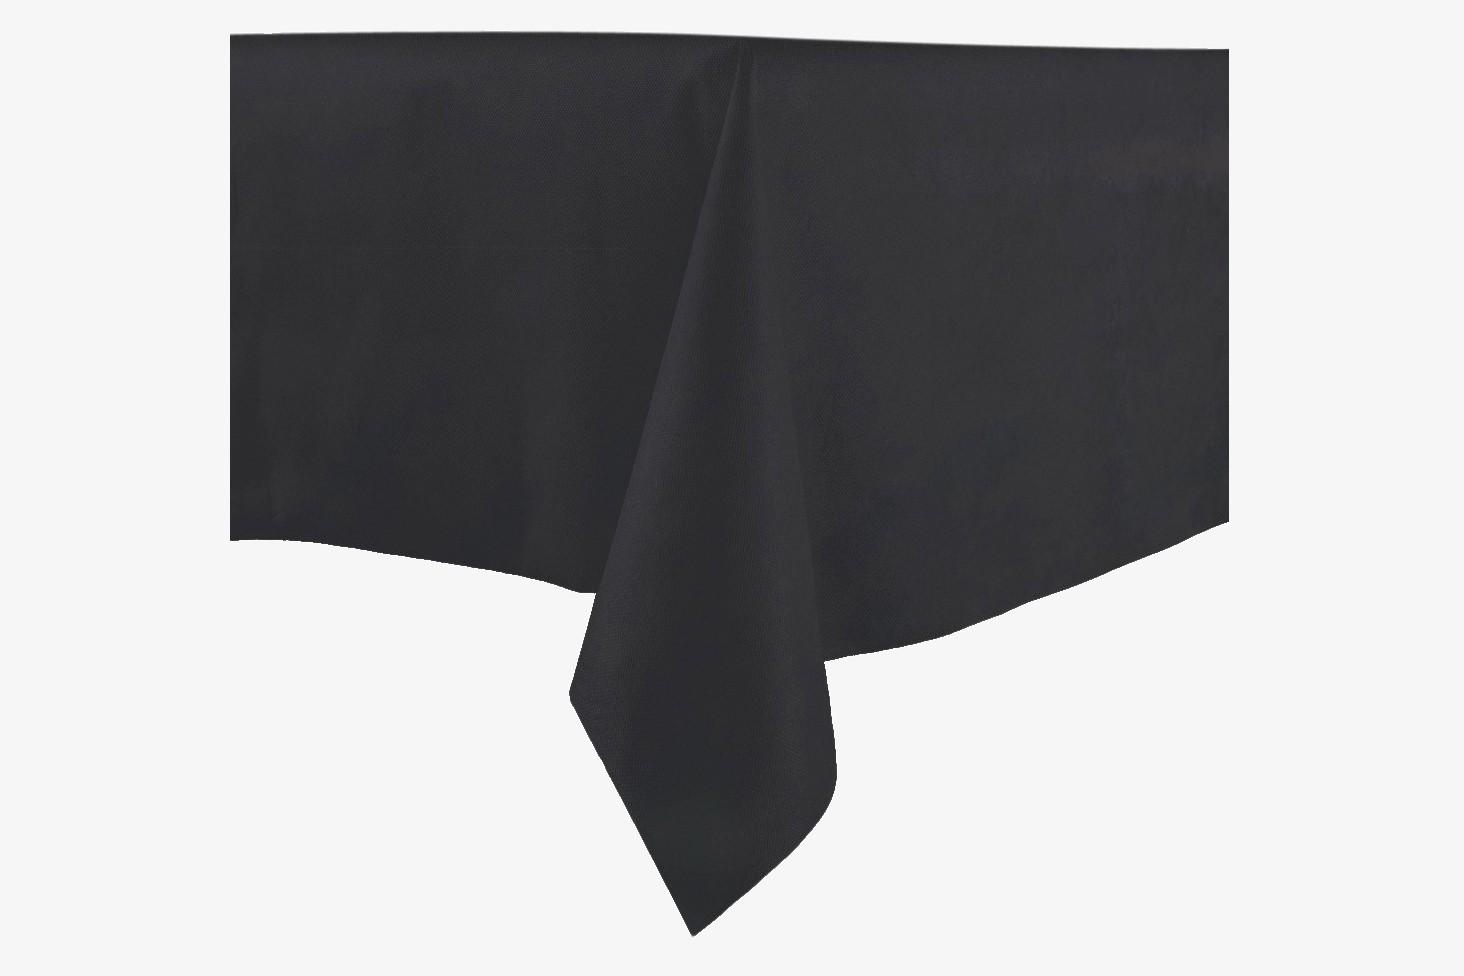 ZB150x250N 黑色桌布 150x250cm 30只